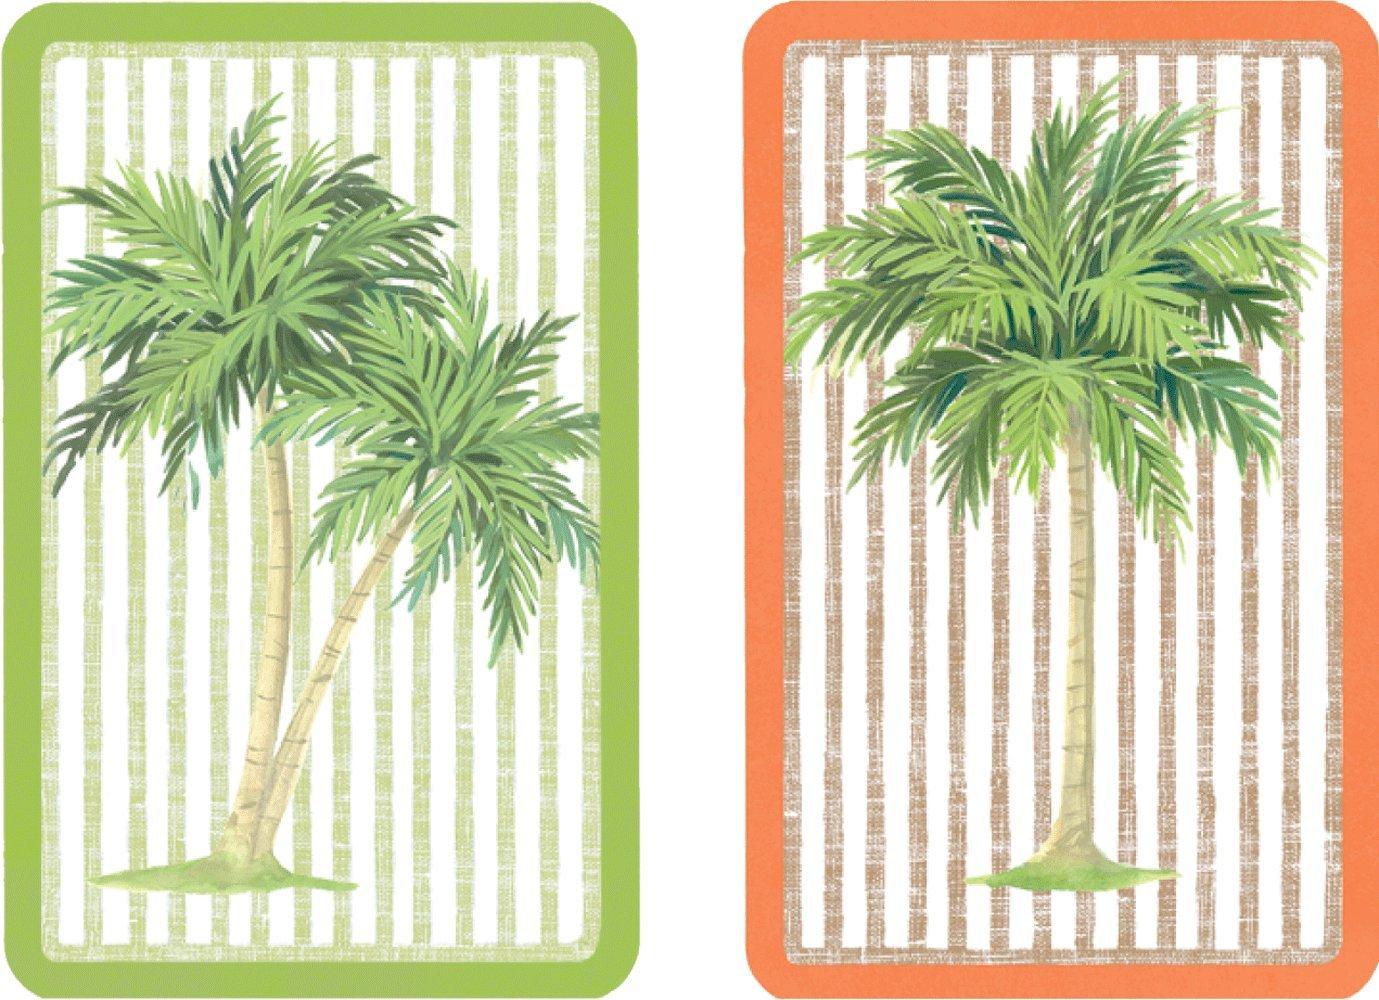 Caspari Palmen Karten mit Jumbo Text, Holz, Mehrfarbig, 13 x 9,5 x 0,1 cm